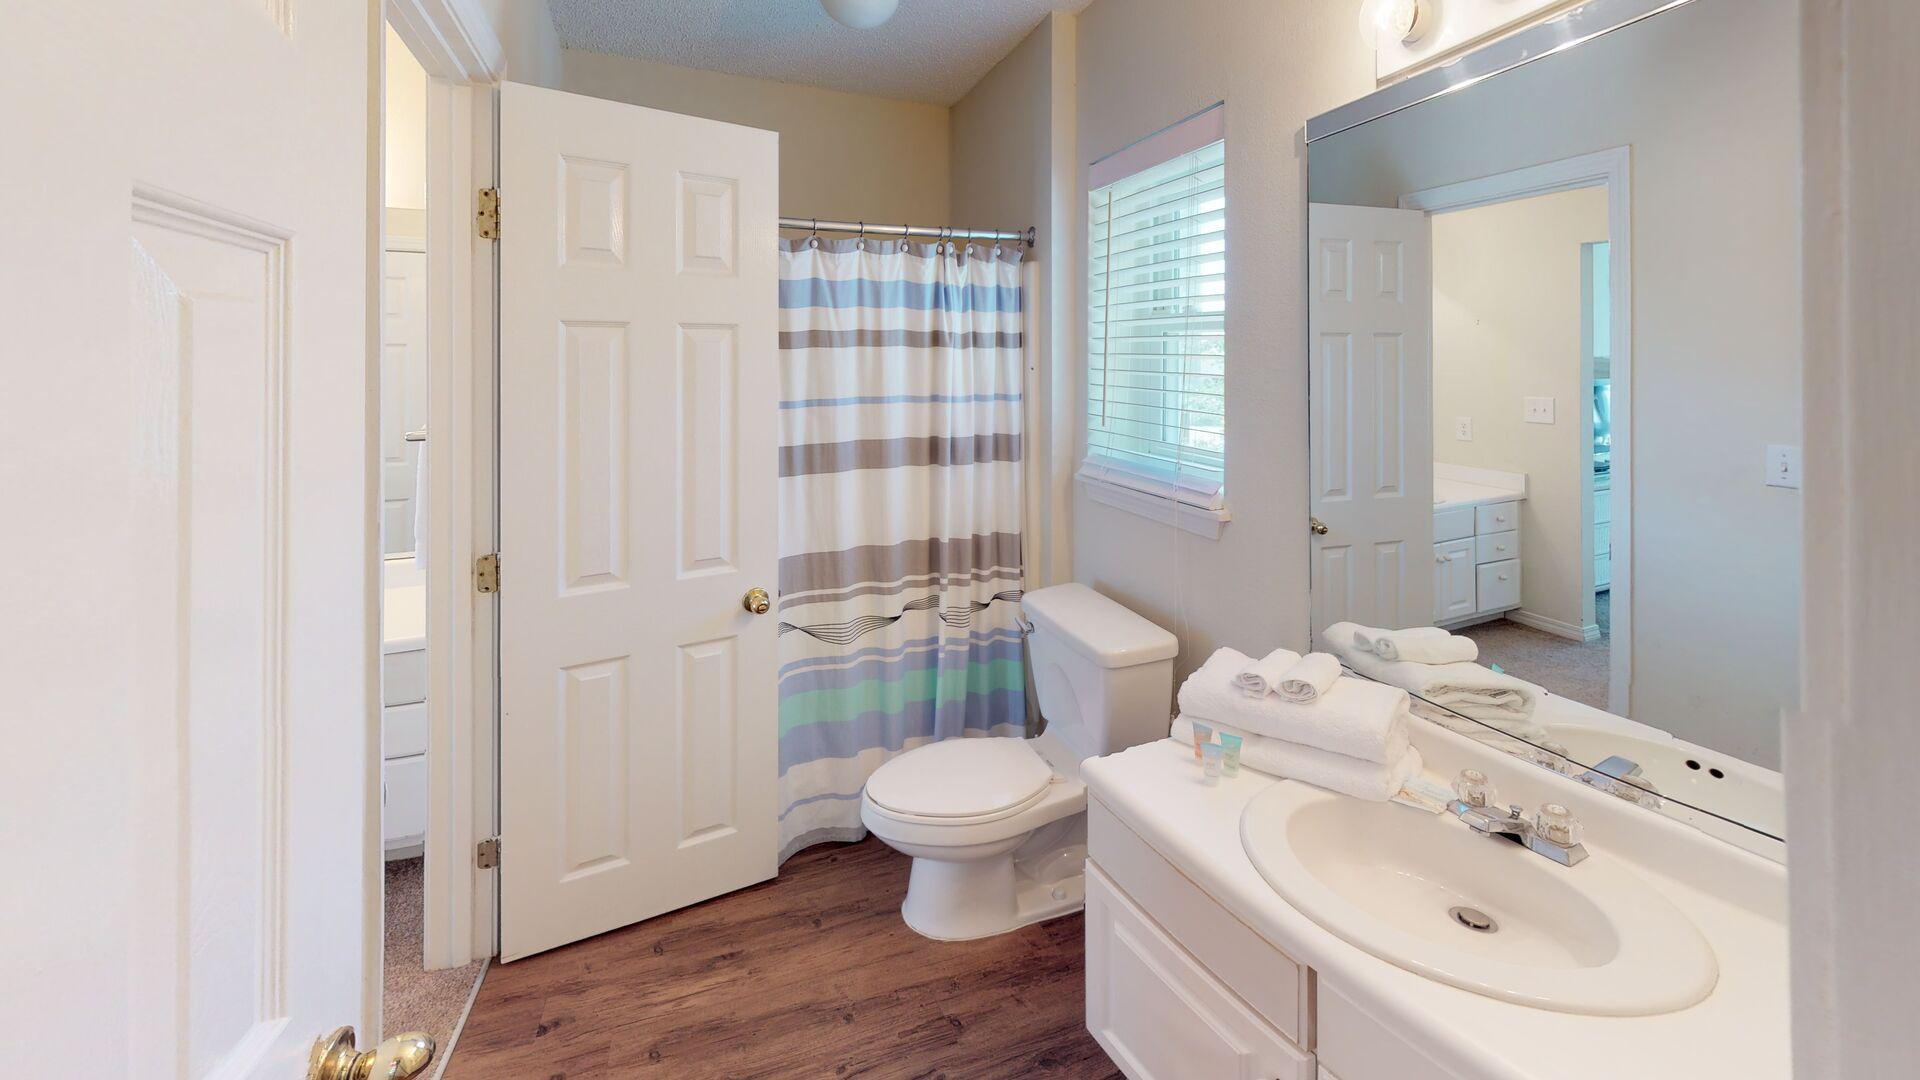 Master bathroom has a tub/shower combo